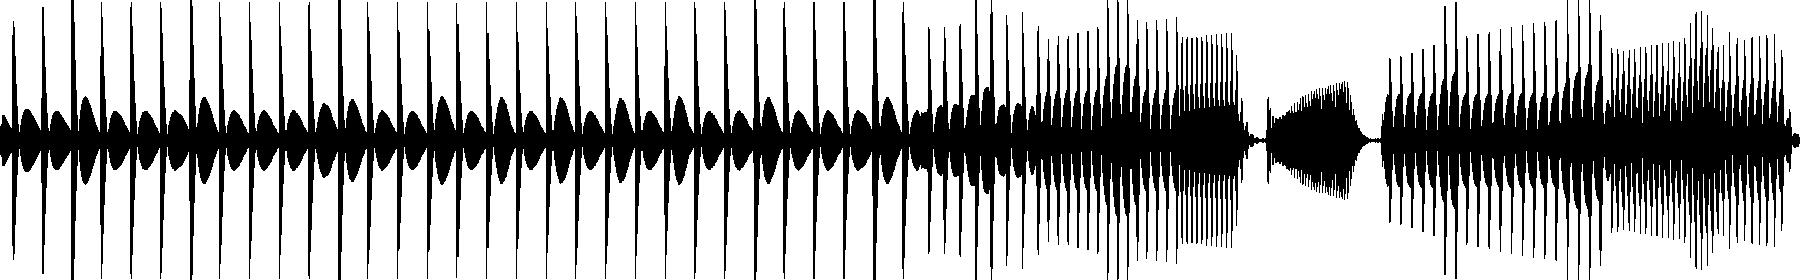 veh2 special sounds   31